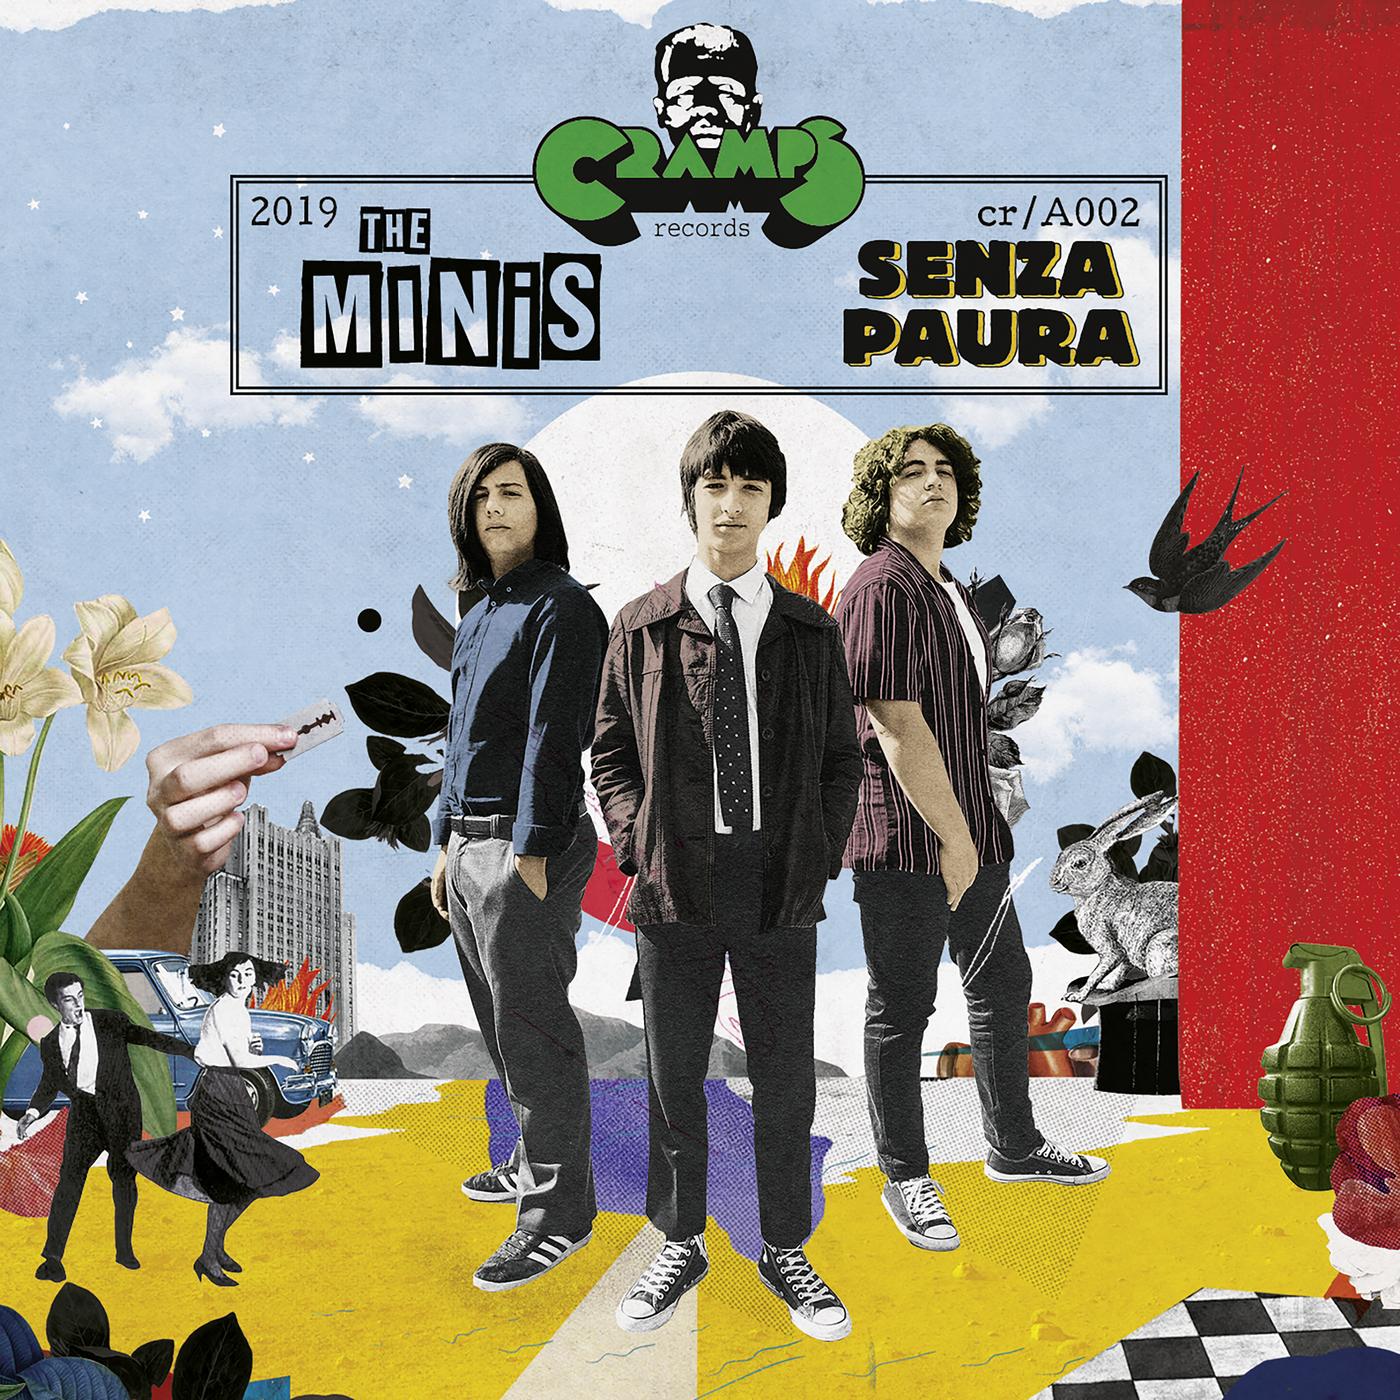 Senza paura - The Minis